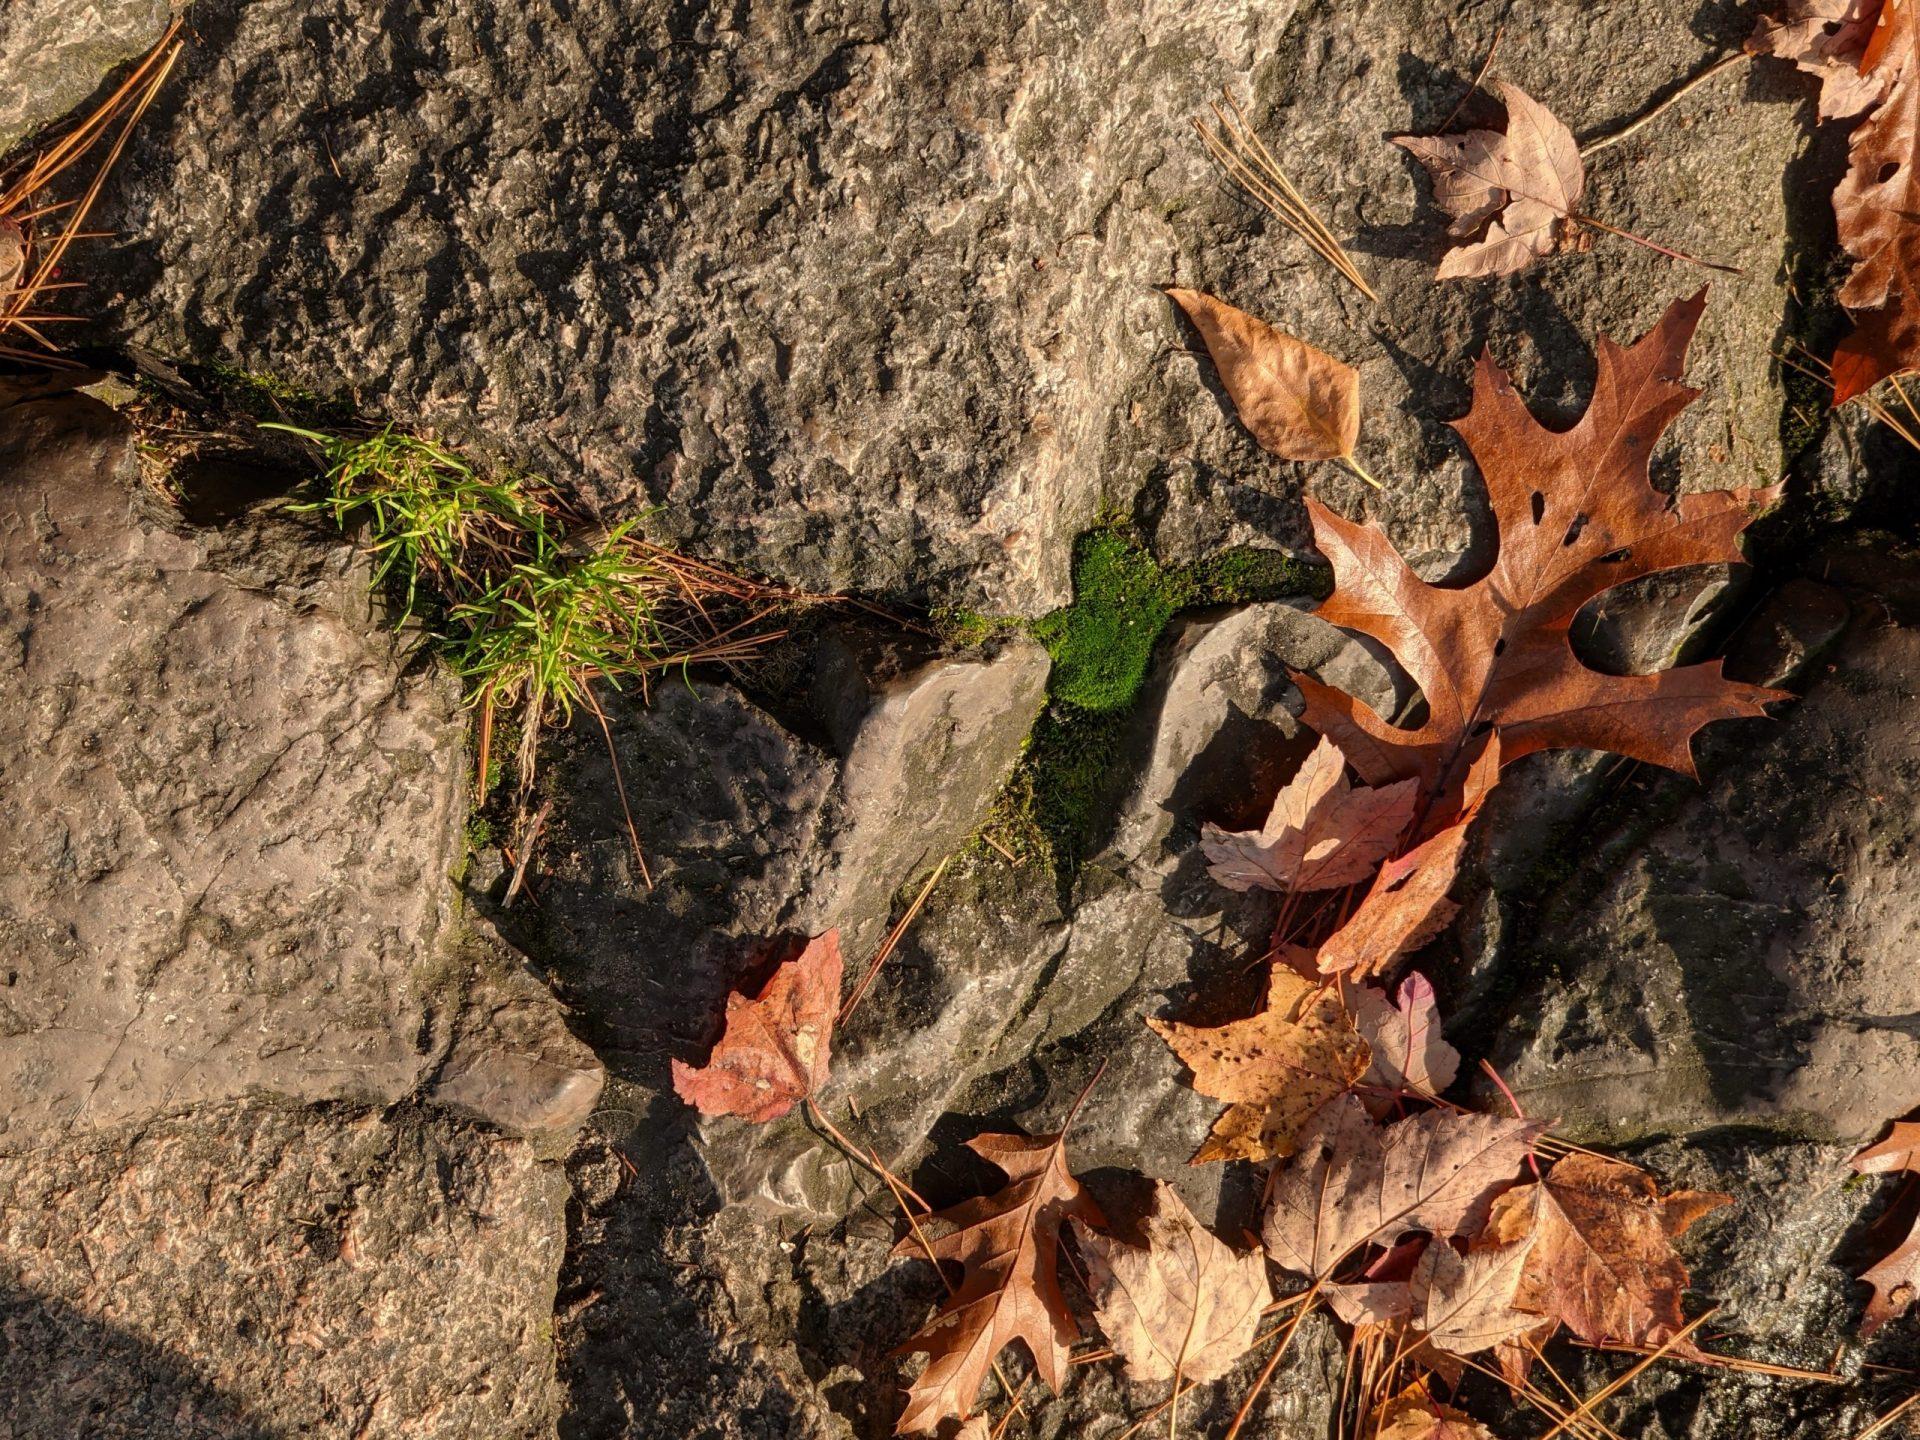 Leaves on rock - October 2020